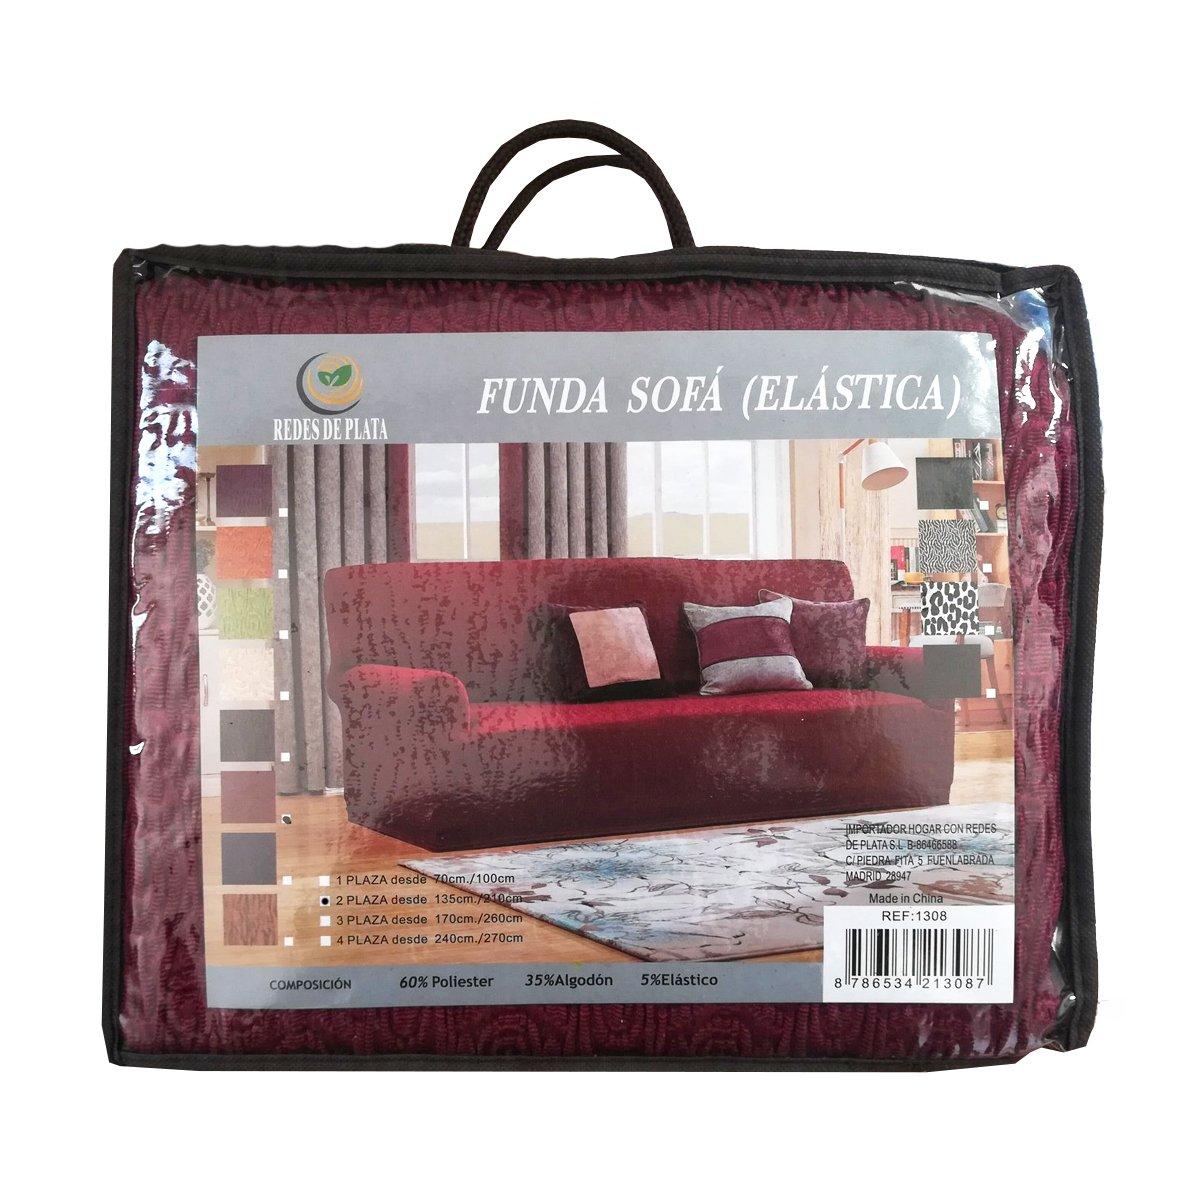 Dabuty Online, SL Funda para Sofa Elastica Dos plazas Color Rojo. De 135 a 210 cm